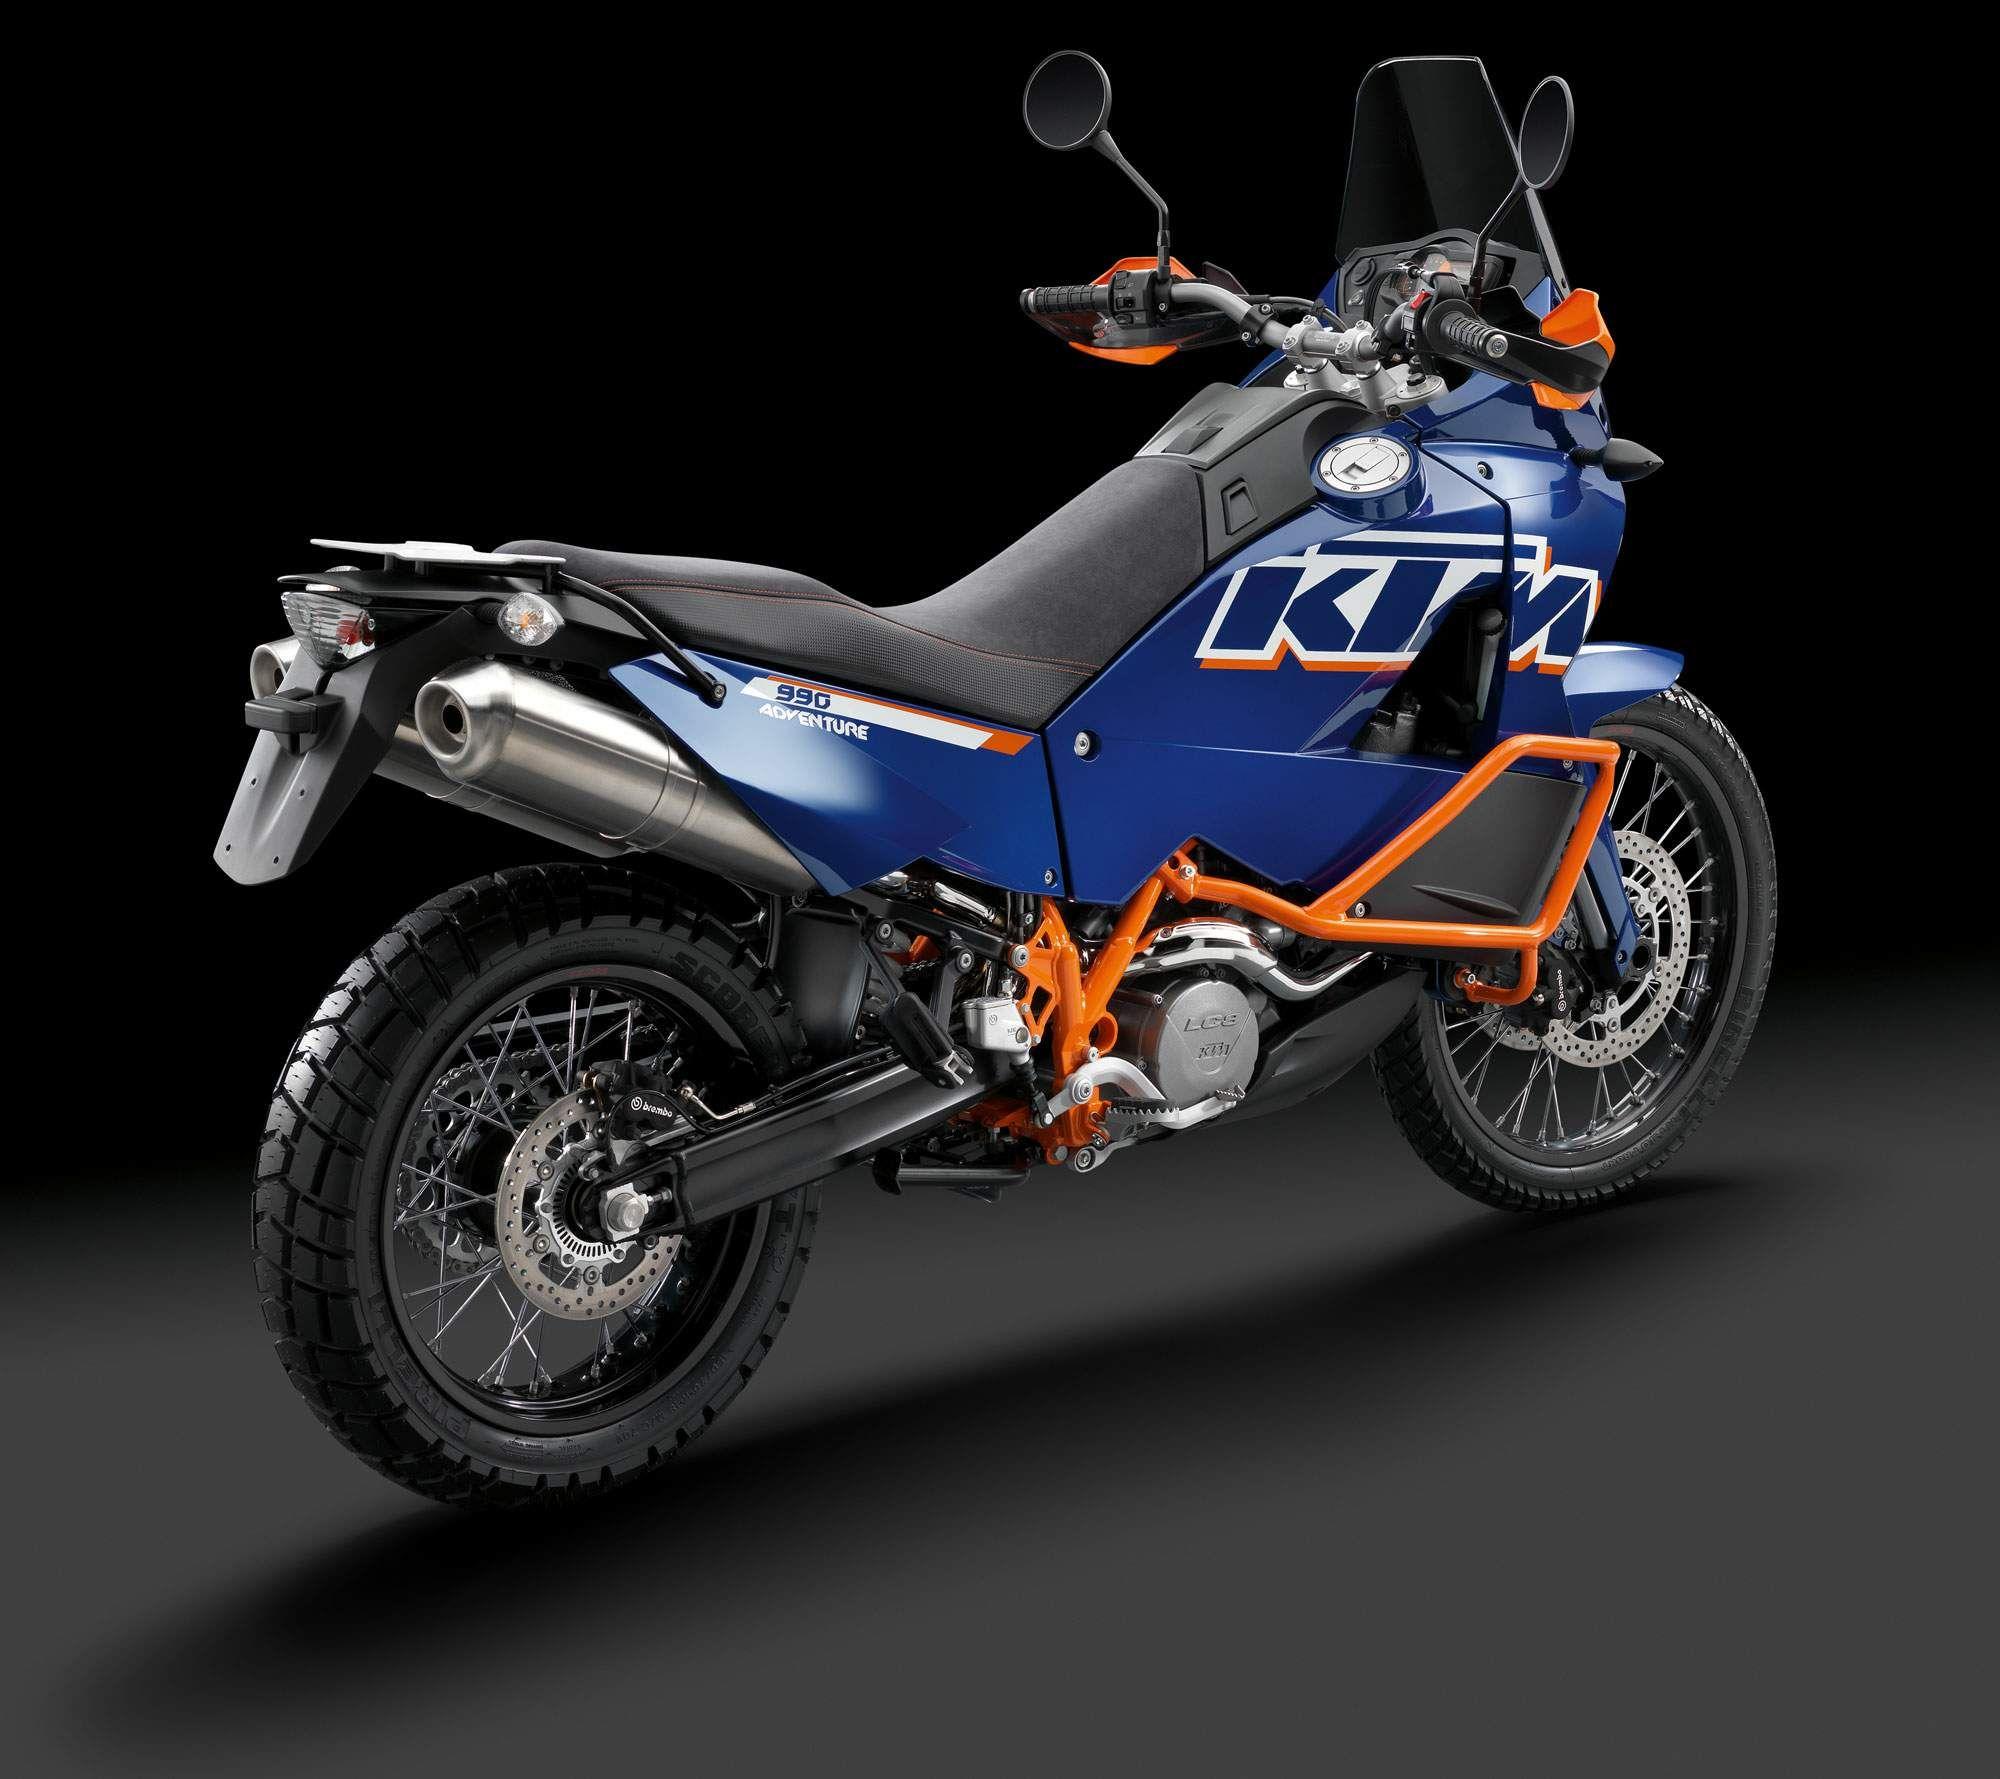 990 Adventure R, 2011 Ktm adventure, Adventure bike, Ktm